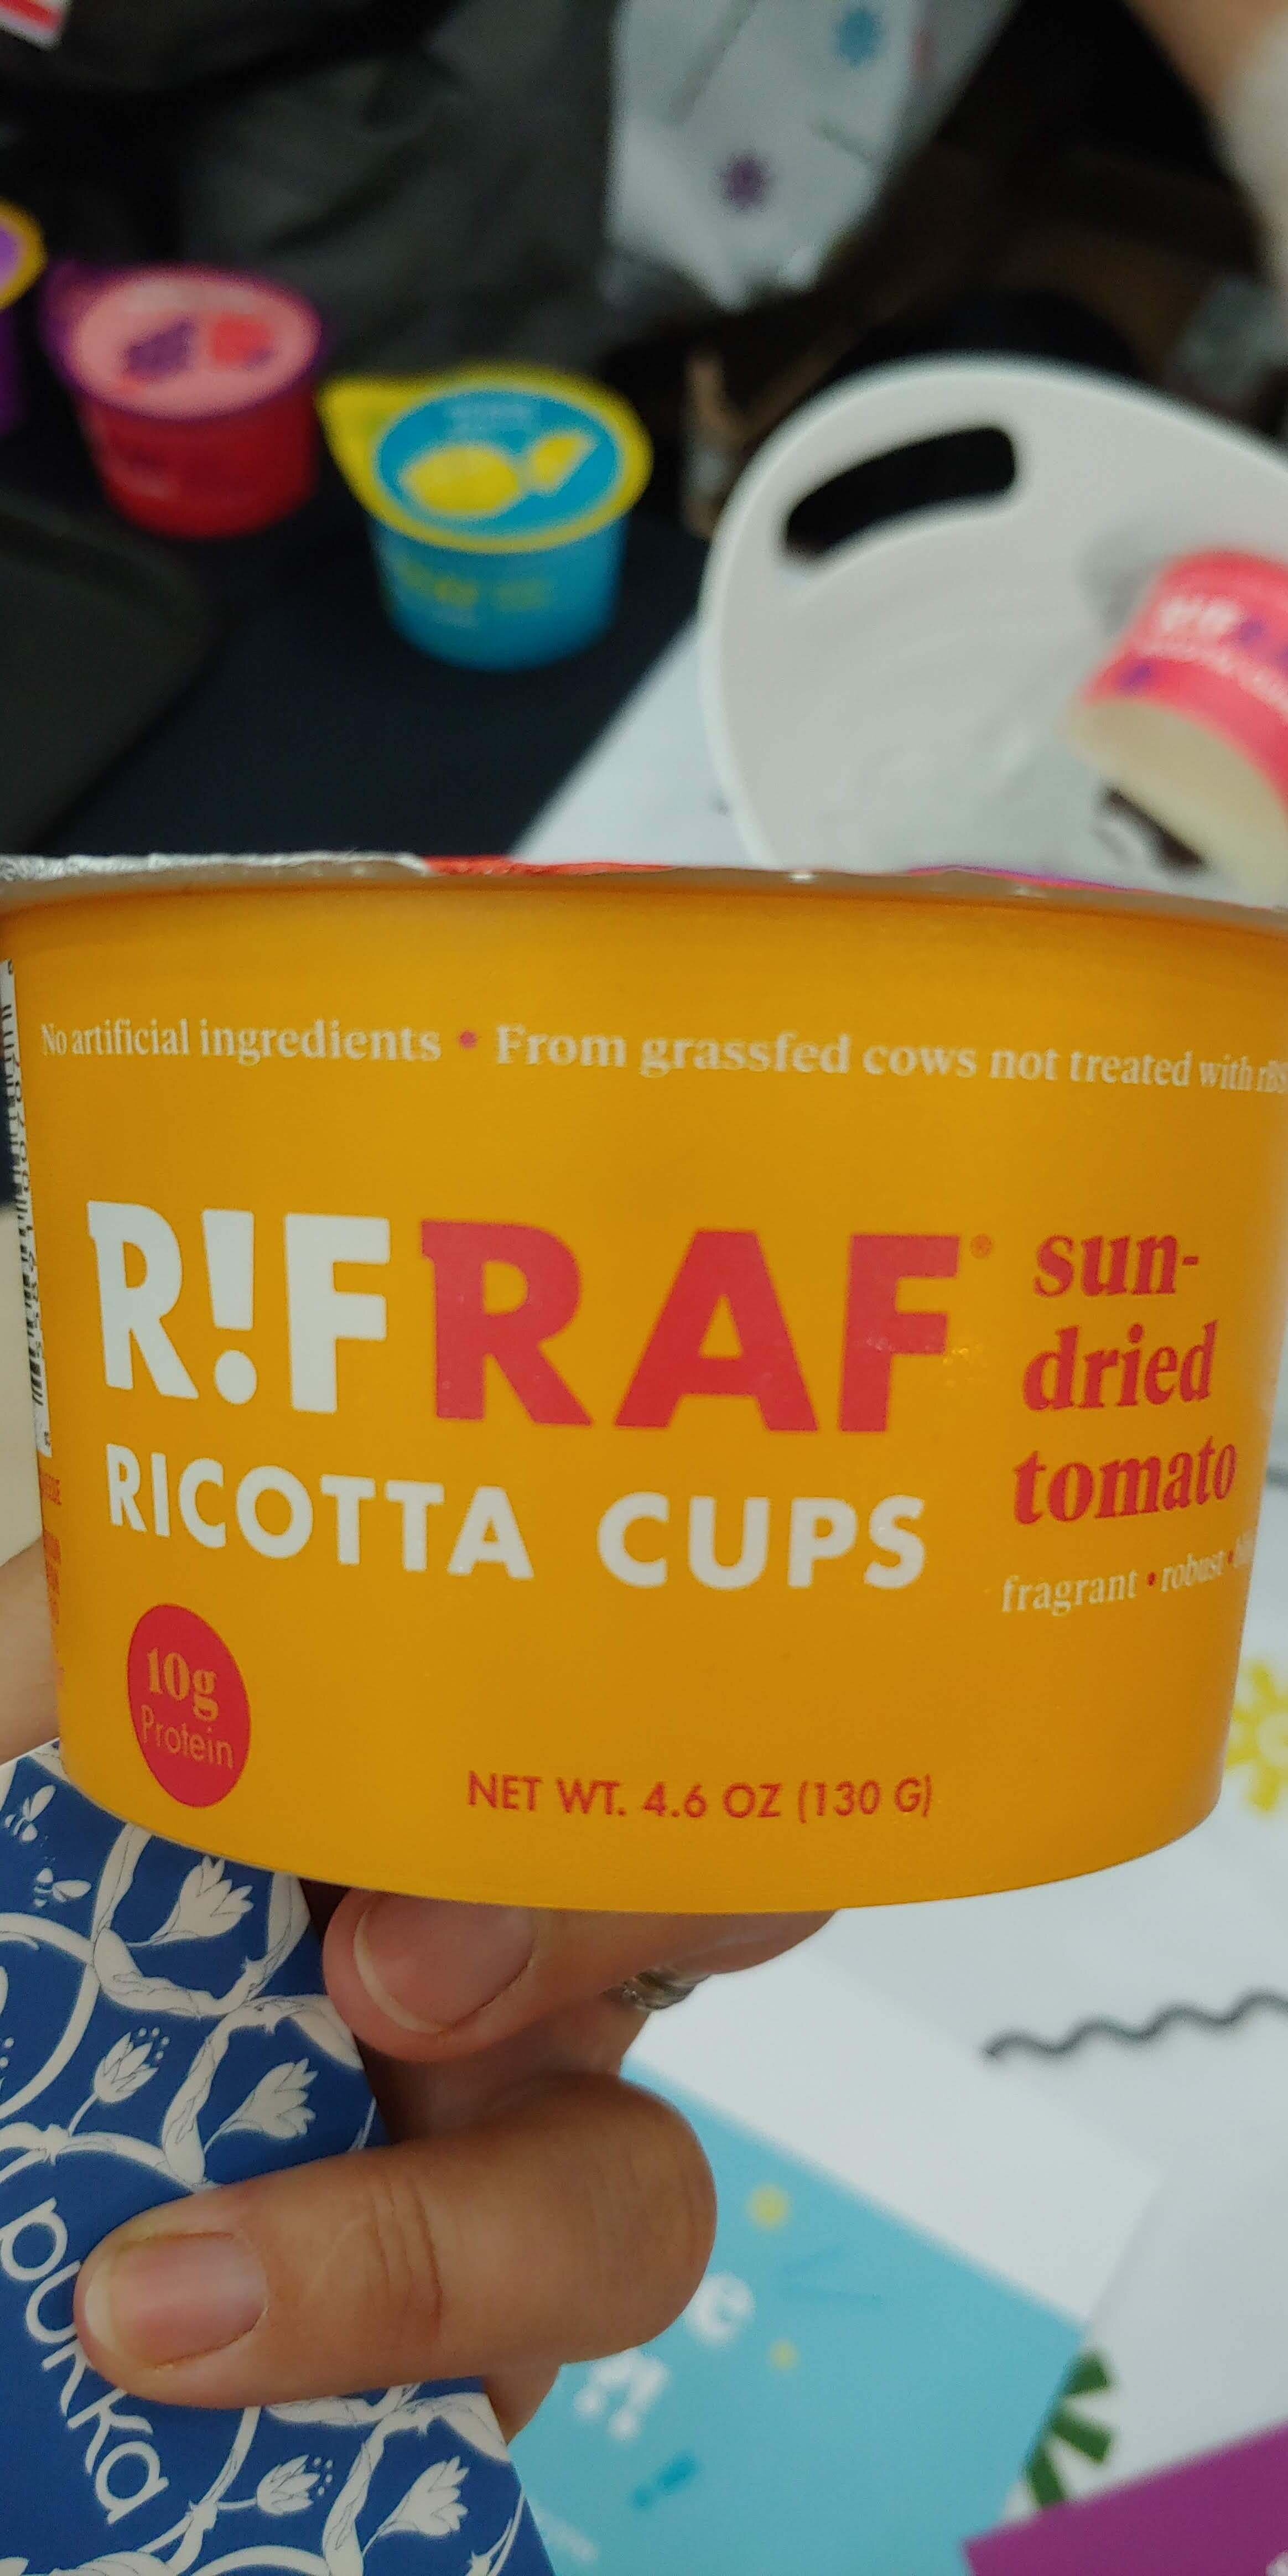 Creamy ricotta, great with veggies!